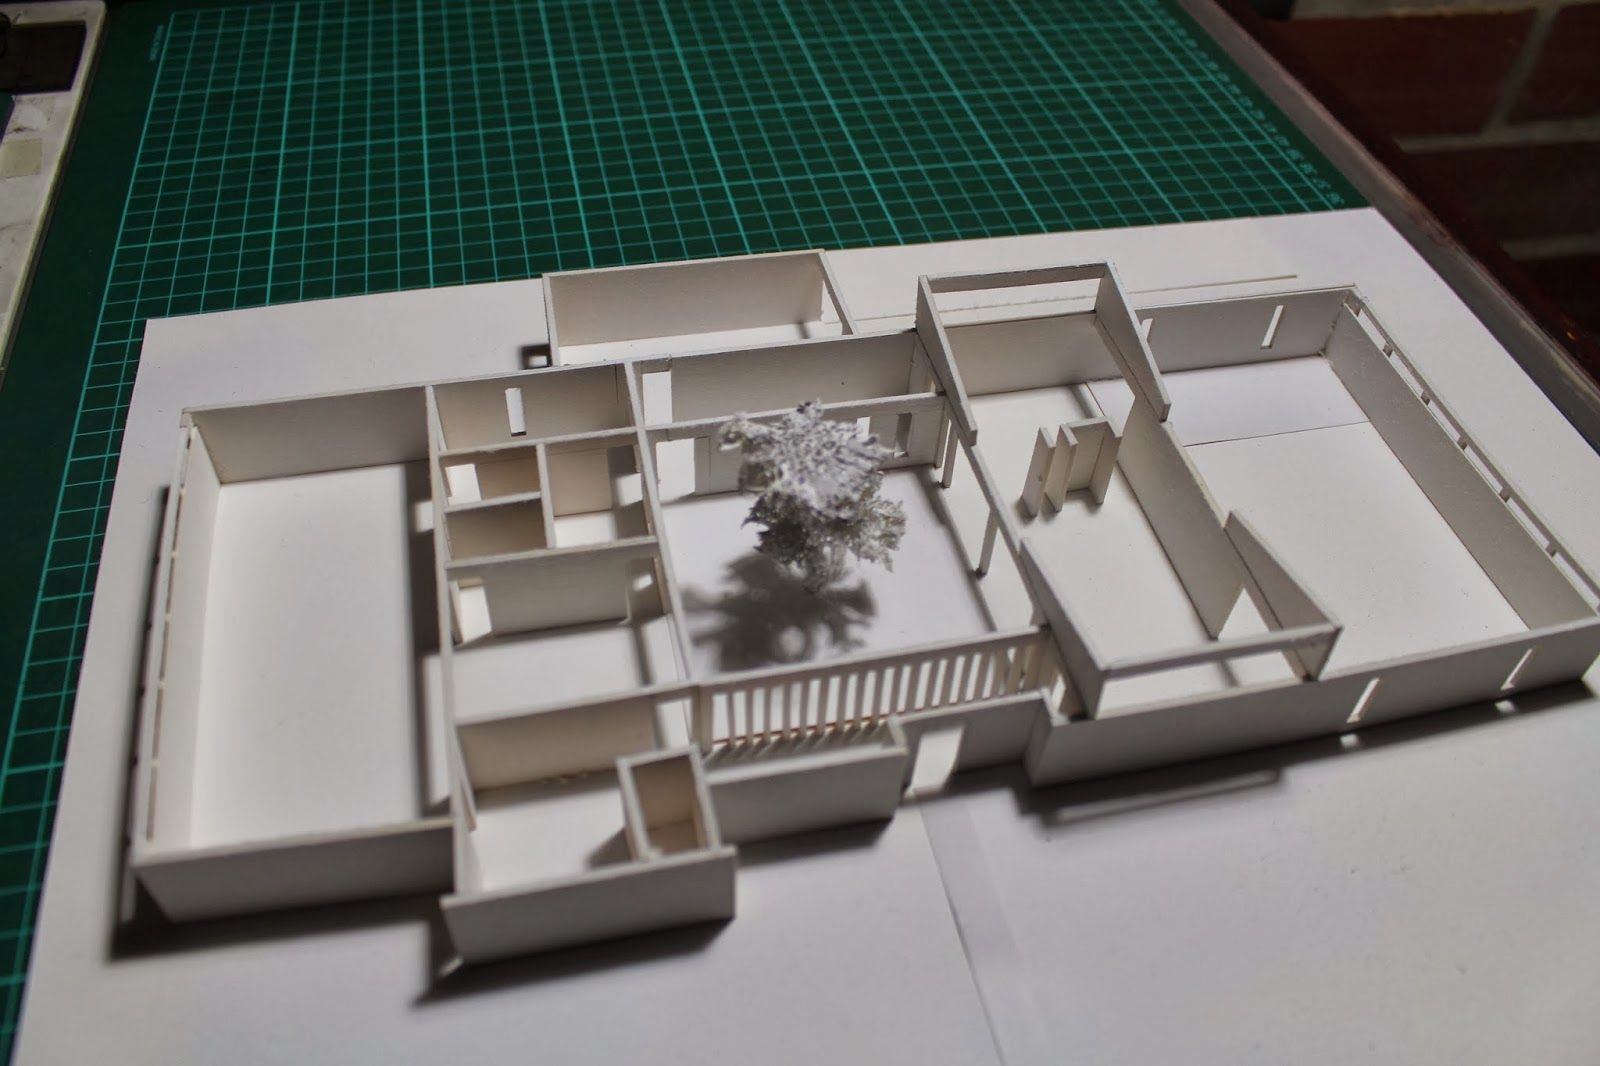 Historia de la arquitectura moderna josep lluis sert for Arquitectura moderna caracteristicas